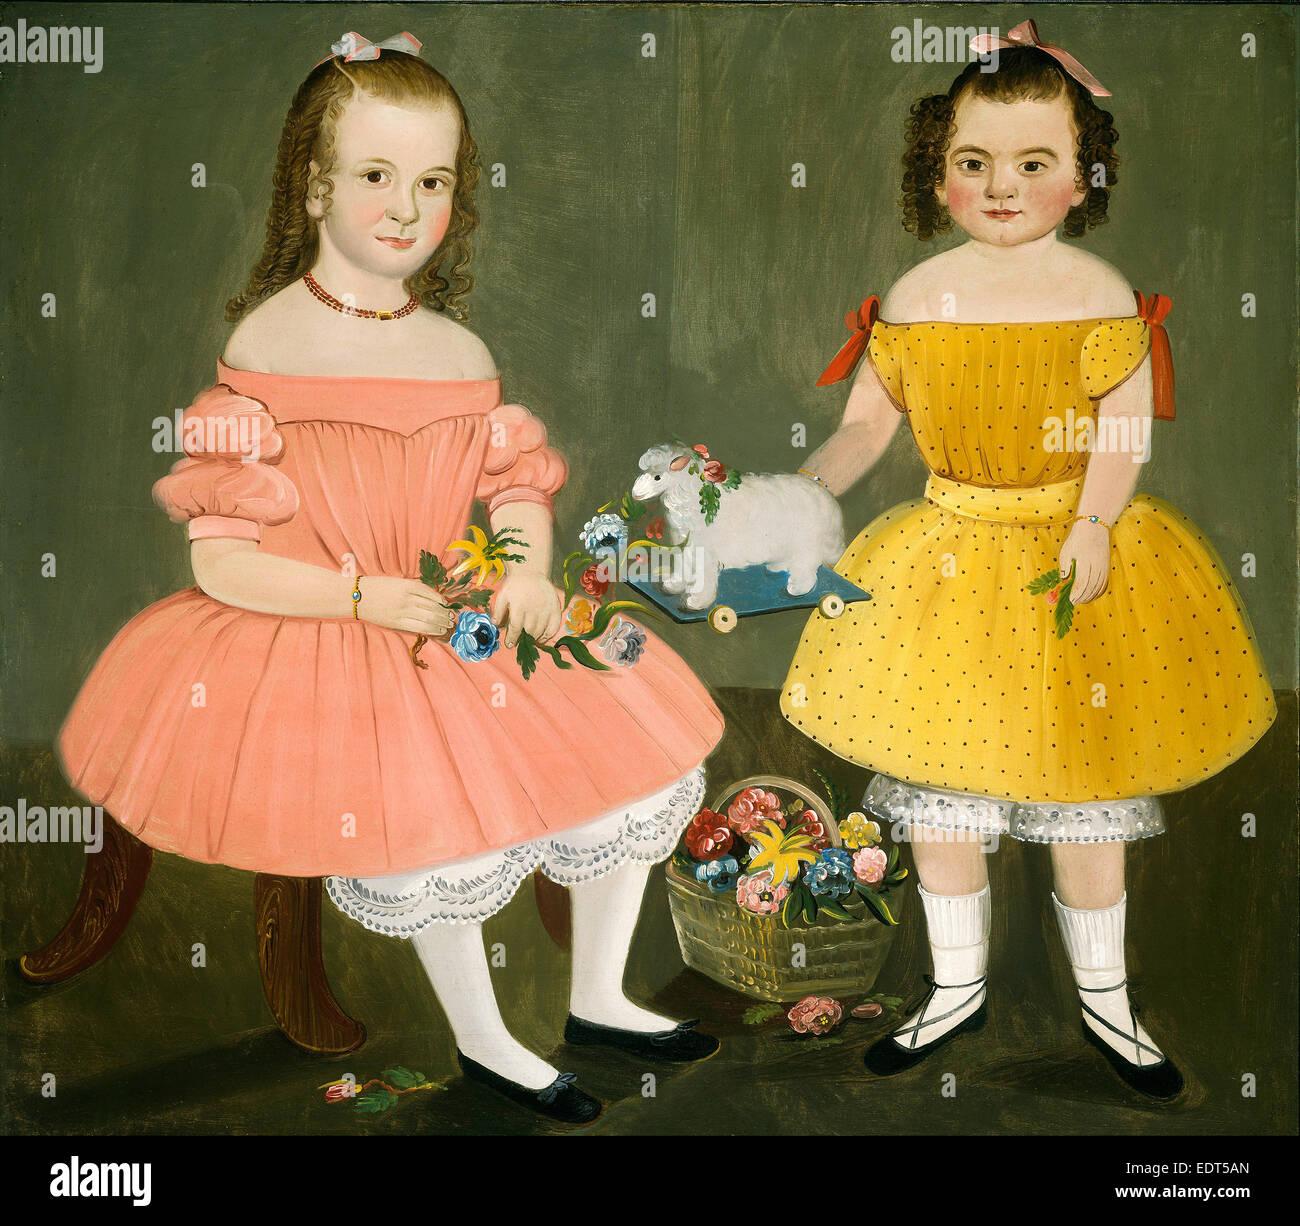 William Matthew Prior, The Burnish Sisters, American, 1806-1873, 1854, oil on canvas - Stock Image